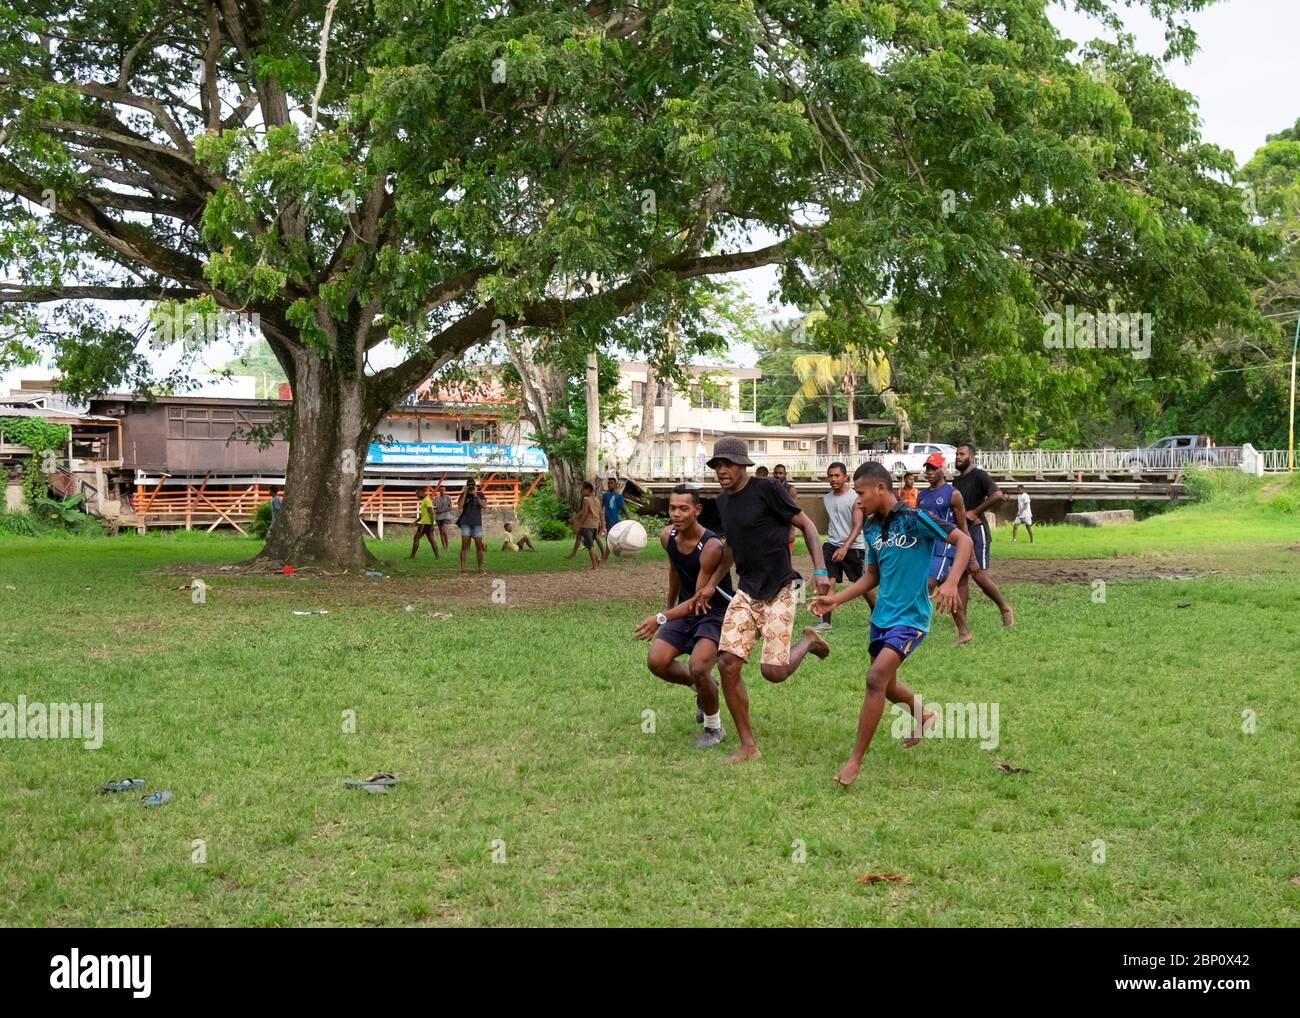 Fijian men play rugby in the local park in Sigatoka (Singatoka), Fiji. Stock Photo